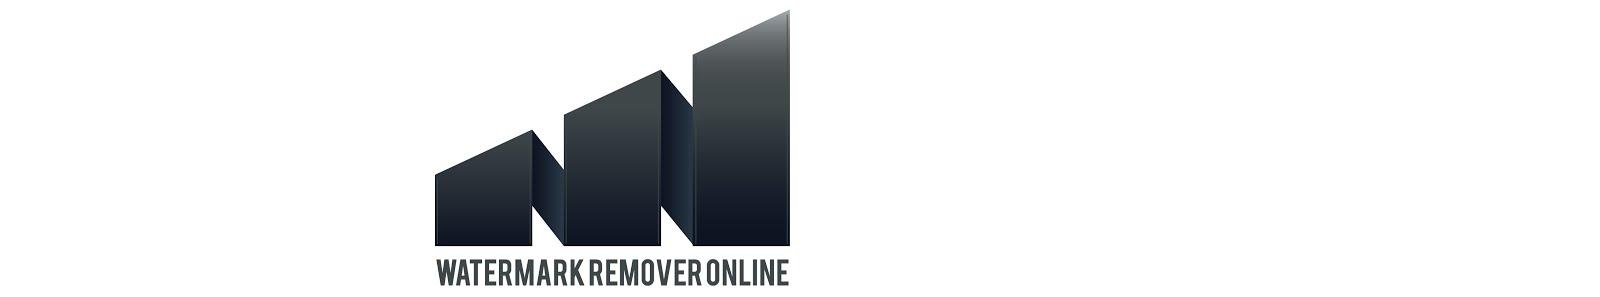 Watermark Remover Online | Remove Watermark